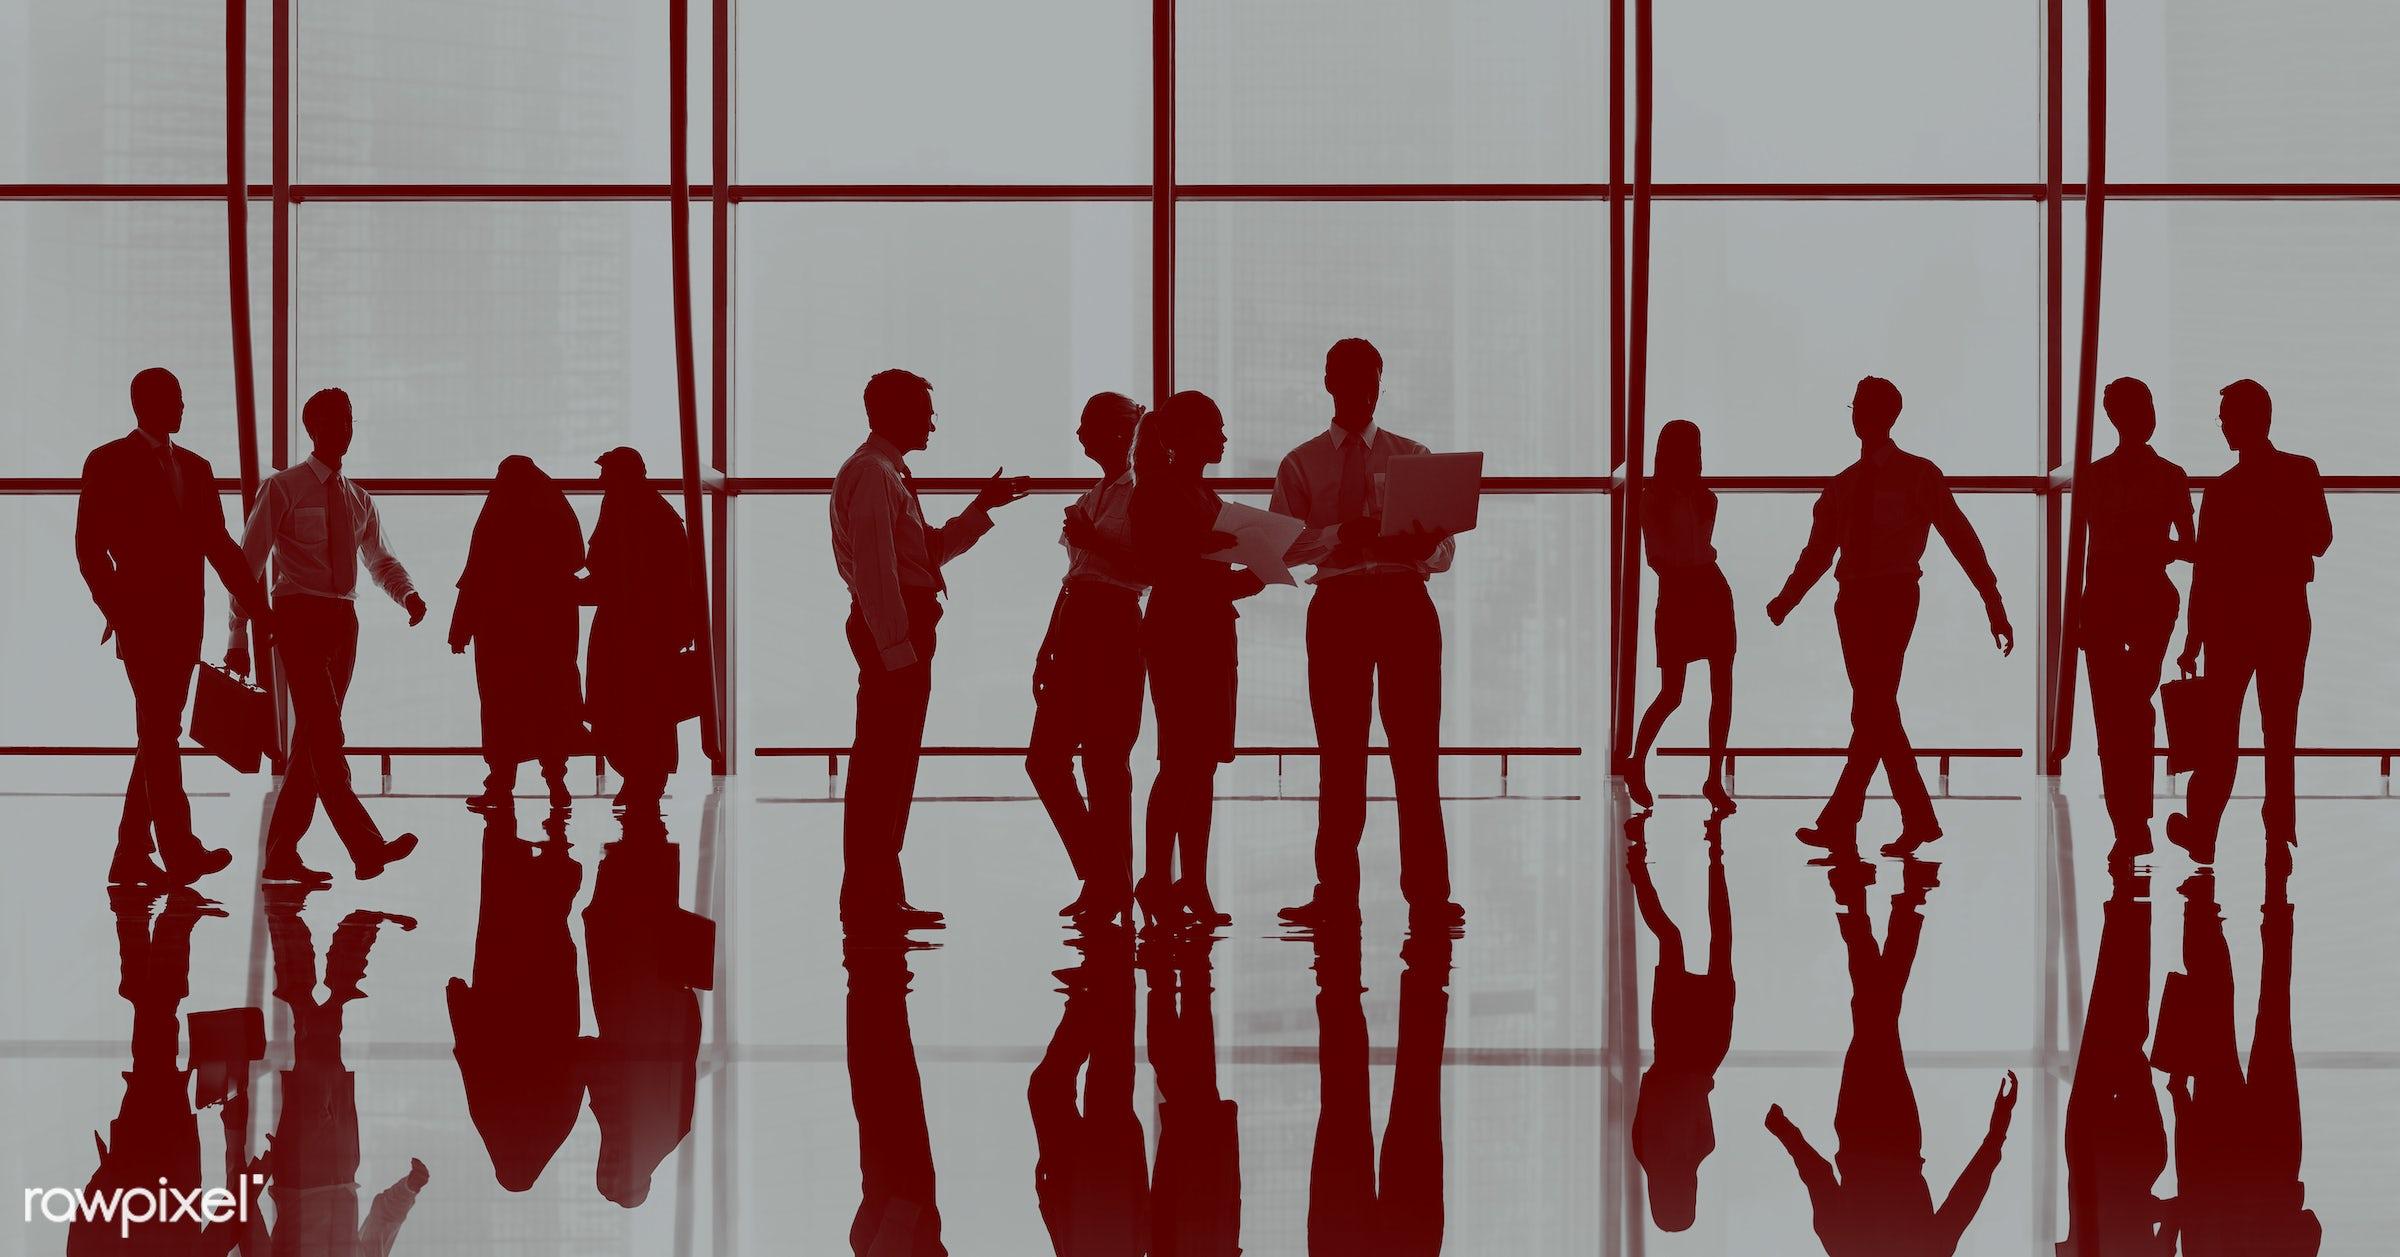 adult, brainstorming, building, business, business people, businessmen, businesswomen, city, city life, cityscape, colleague...